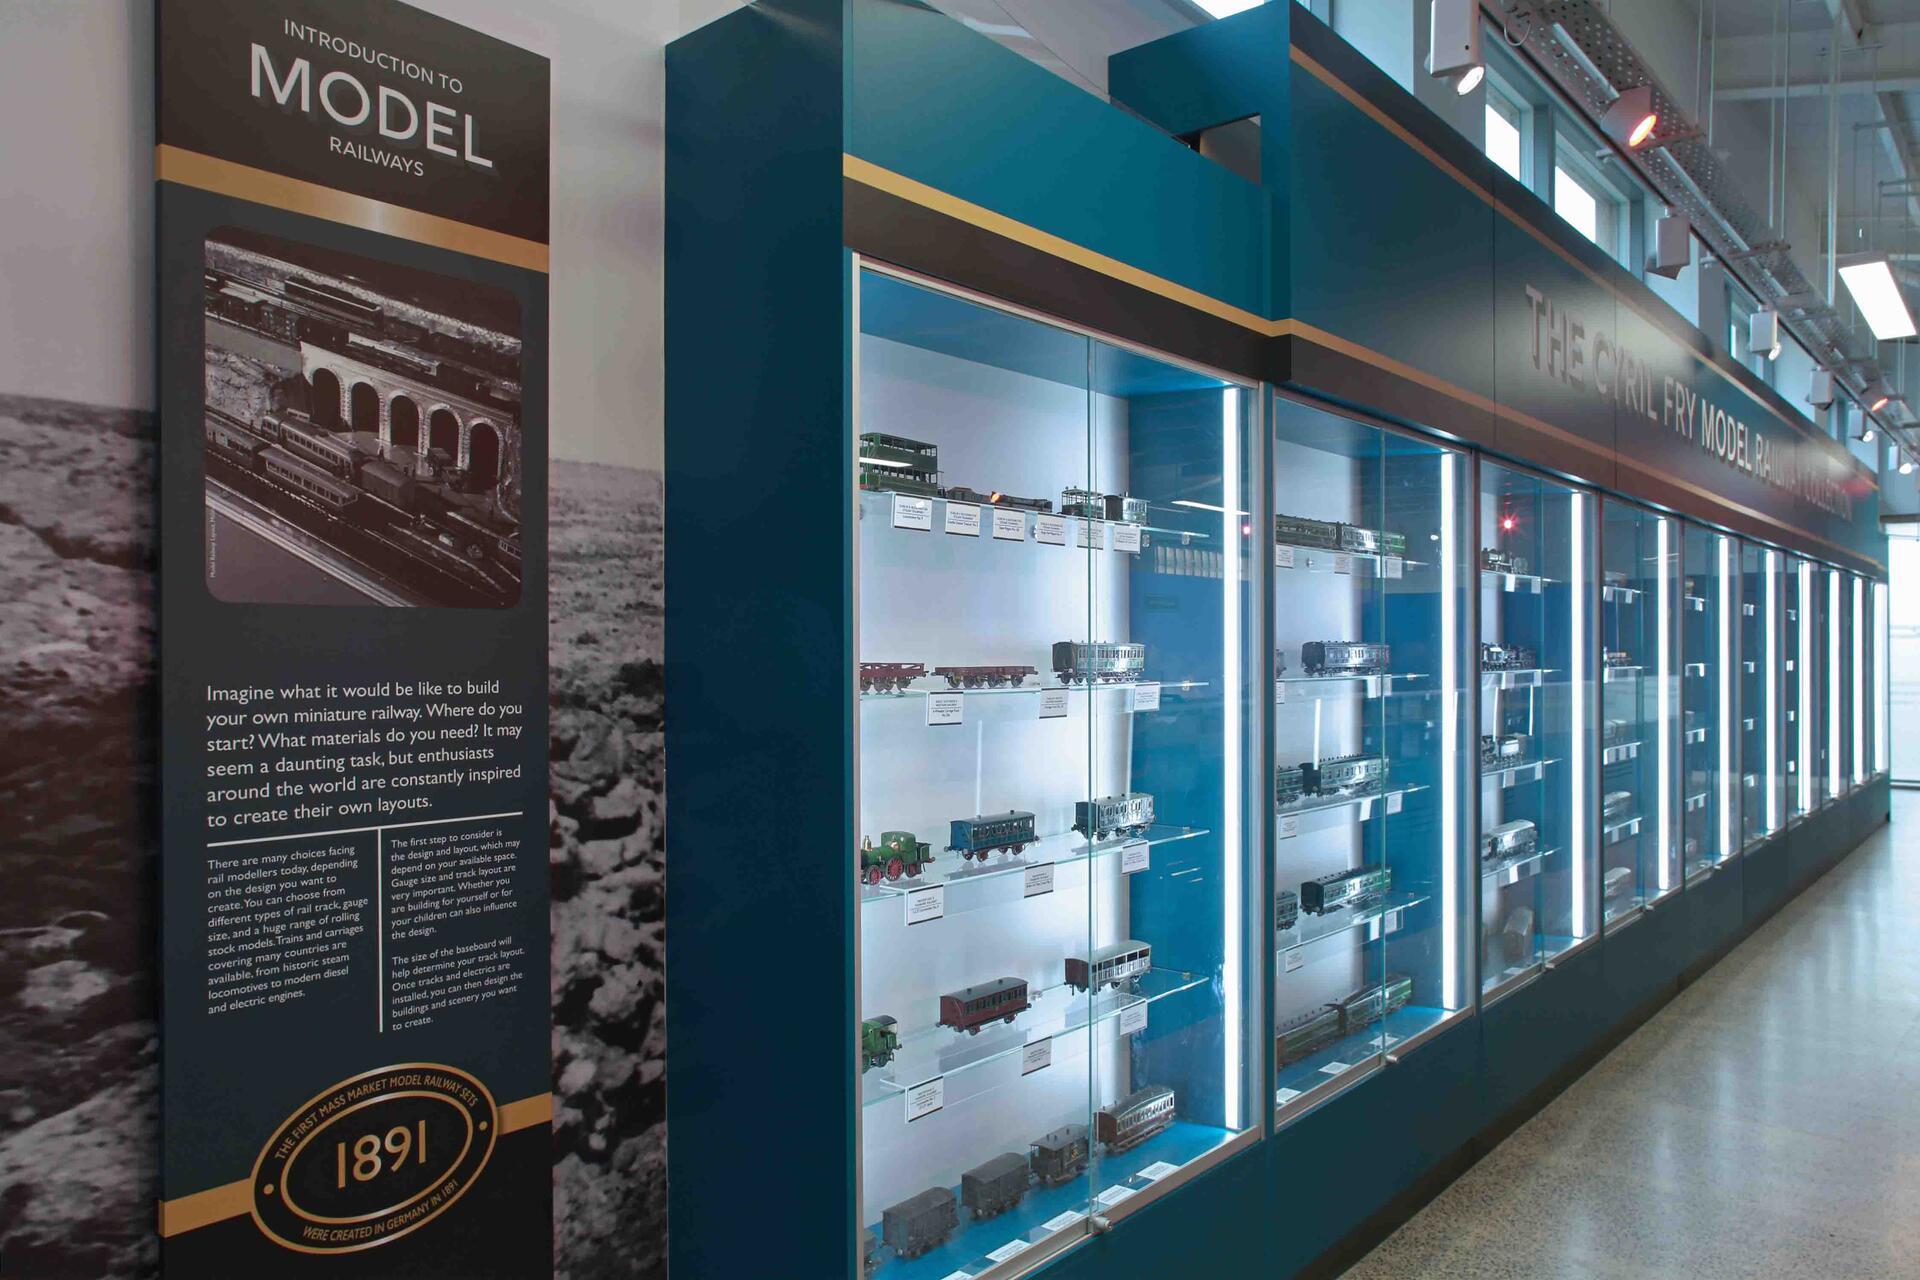 Fry Model Railway Museum (9)